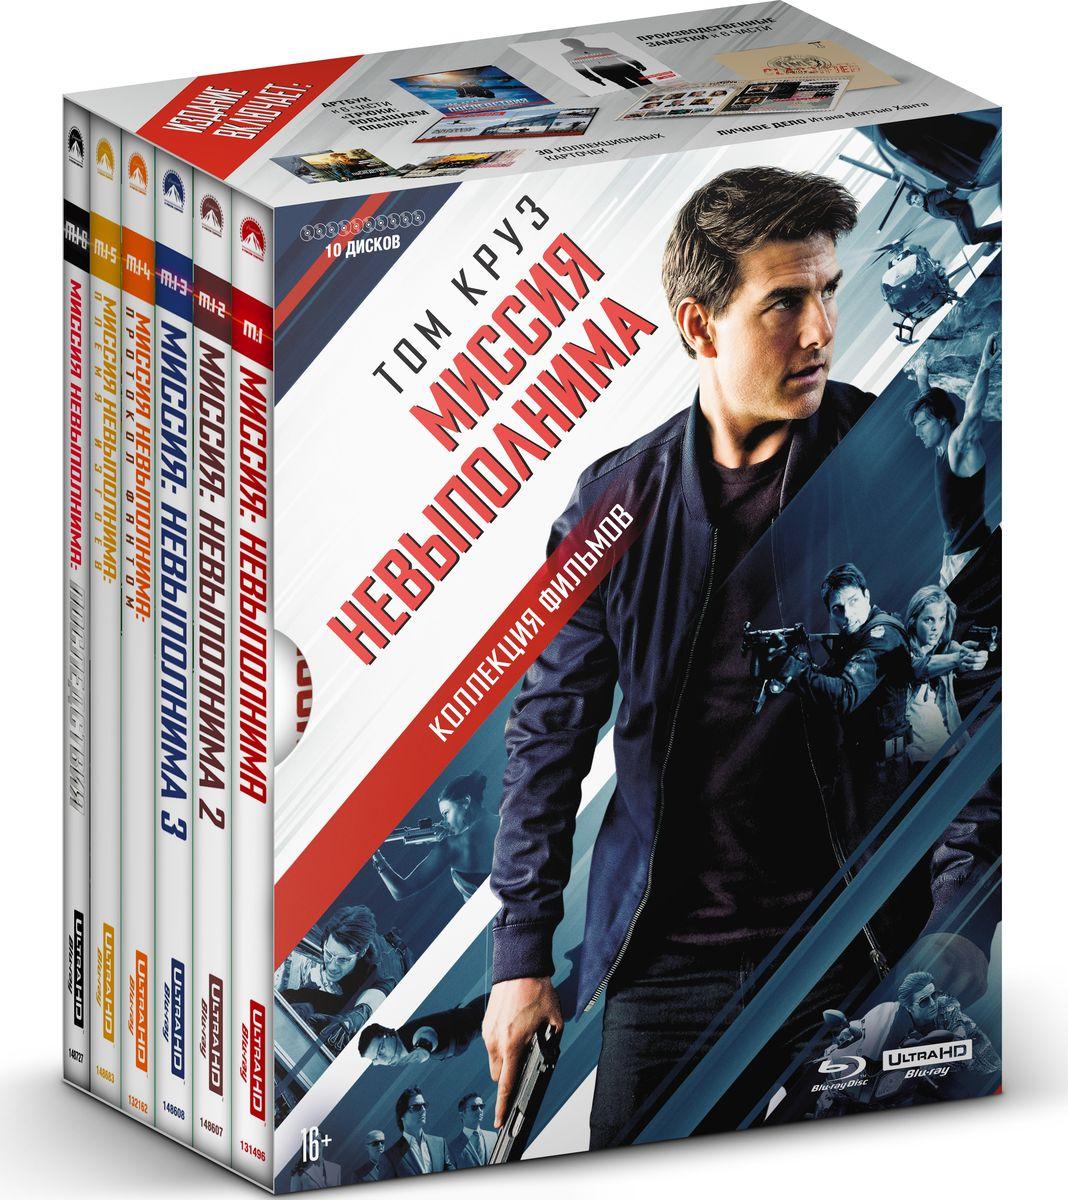 Миссия невыполнима. Коллекция (4K UHD Blu-ray + 10 Blu-ray) зимние сказки сборник мультфильмов blu ray